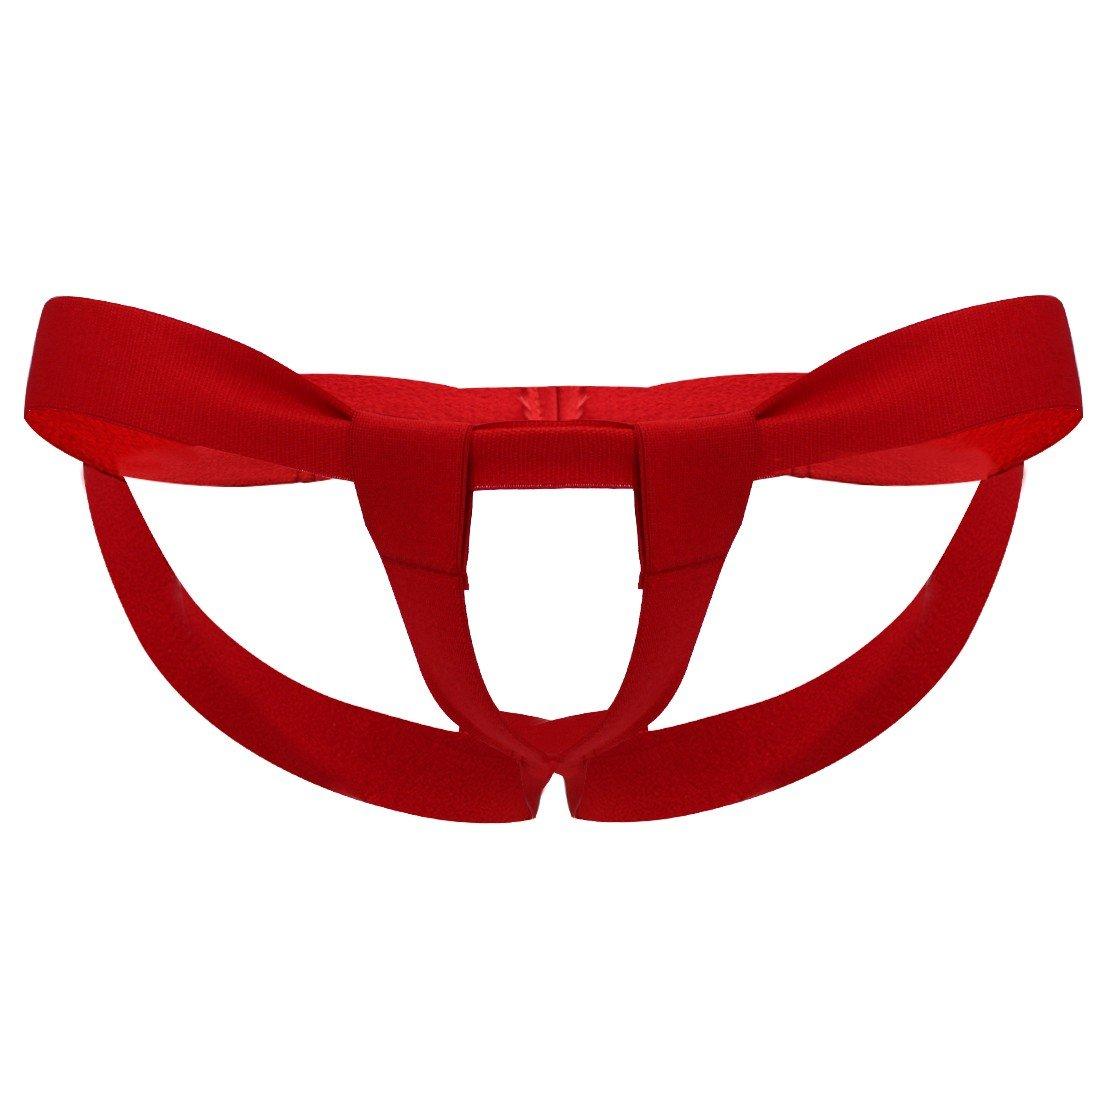 iEFiEL Mens Bare Back Sliding Ring Enhancing Strap Underwear Underpants T-Back (Red B)